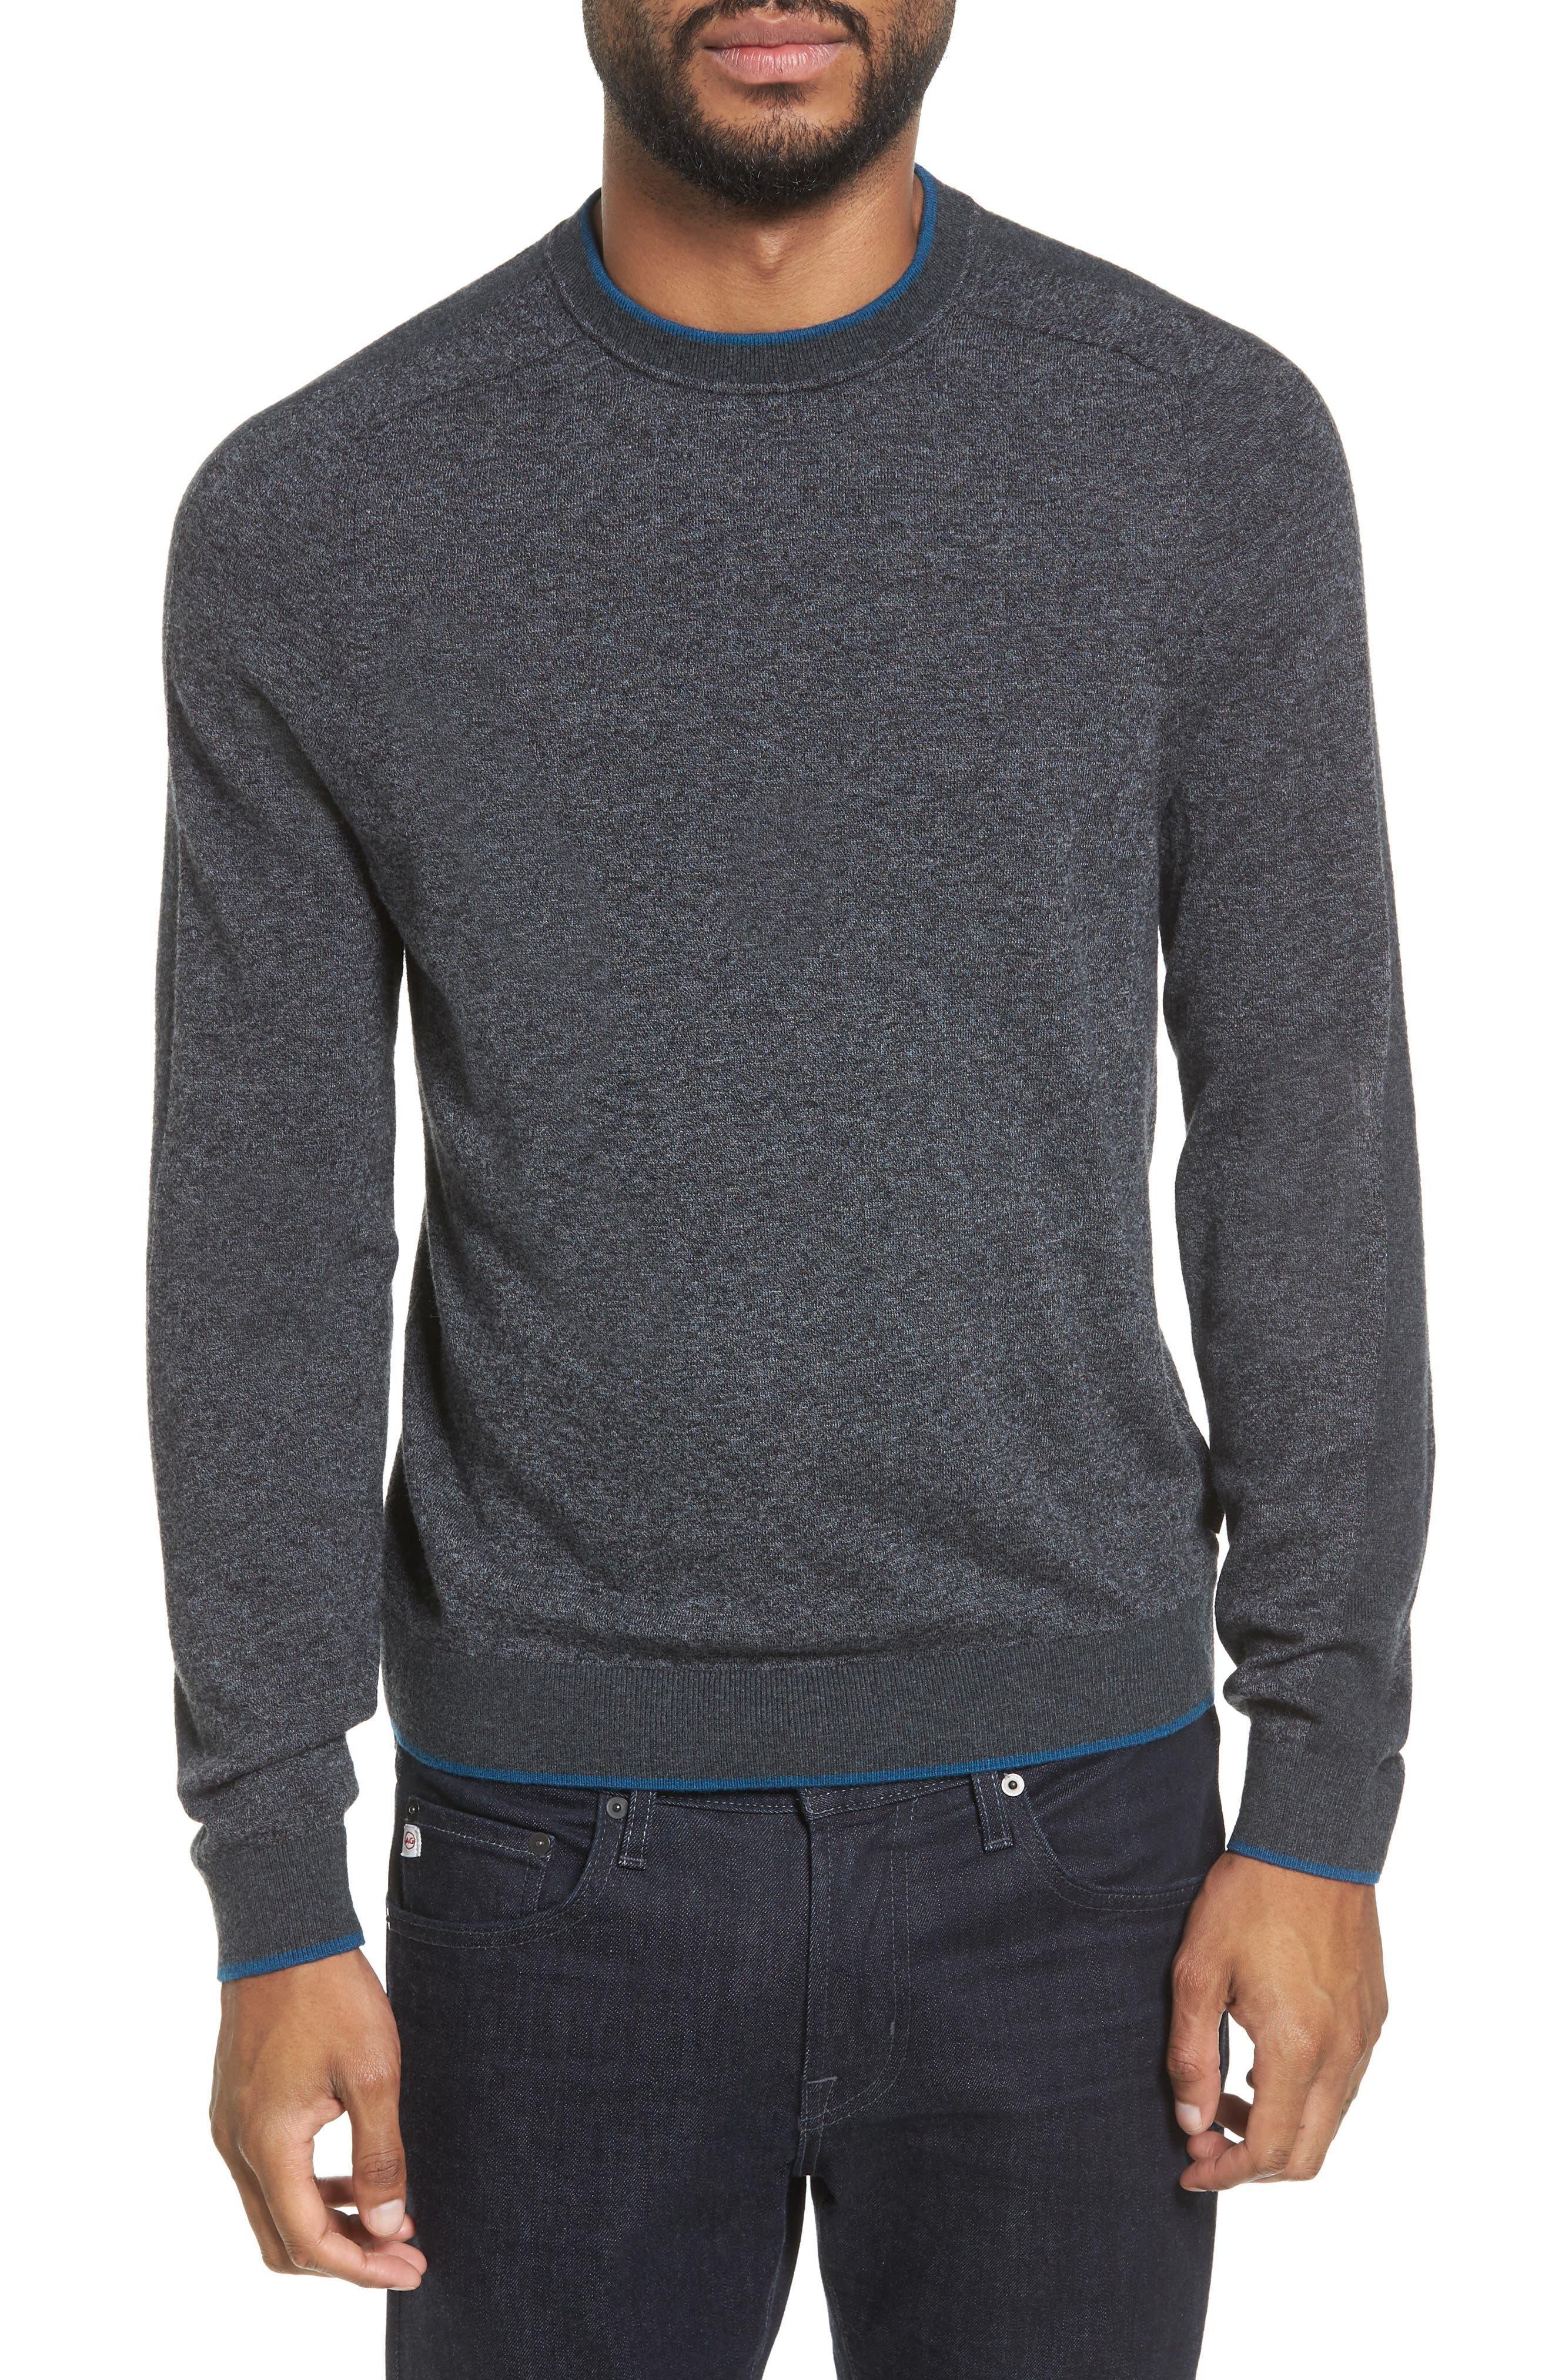 Norpol Crewneck Sweater,                         Main,                         color,